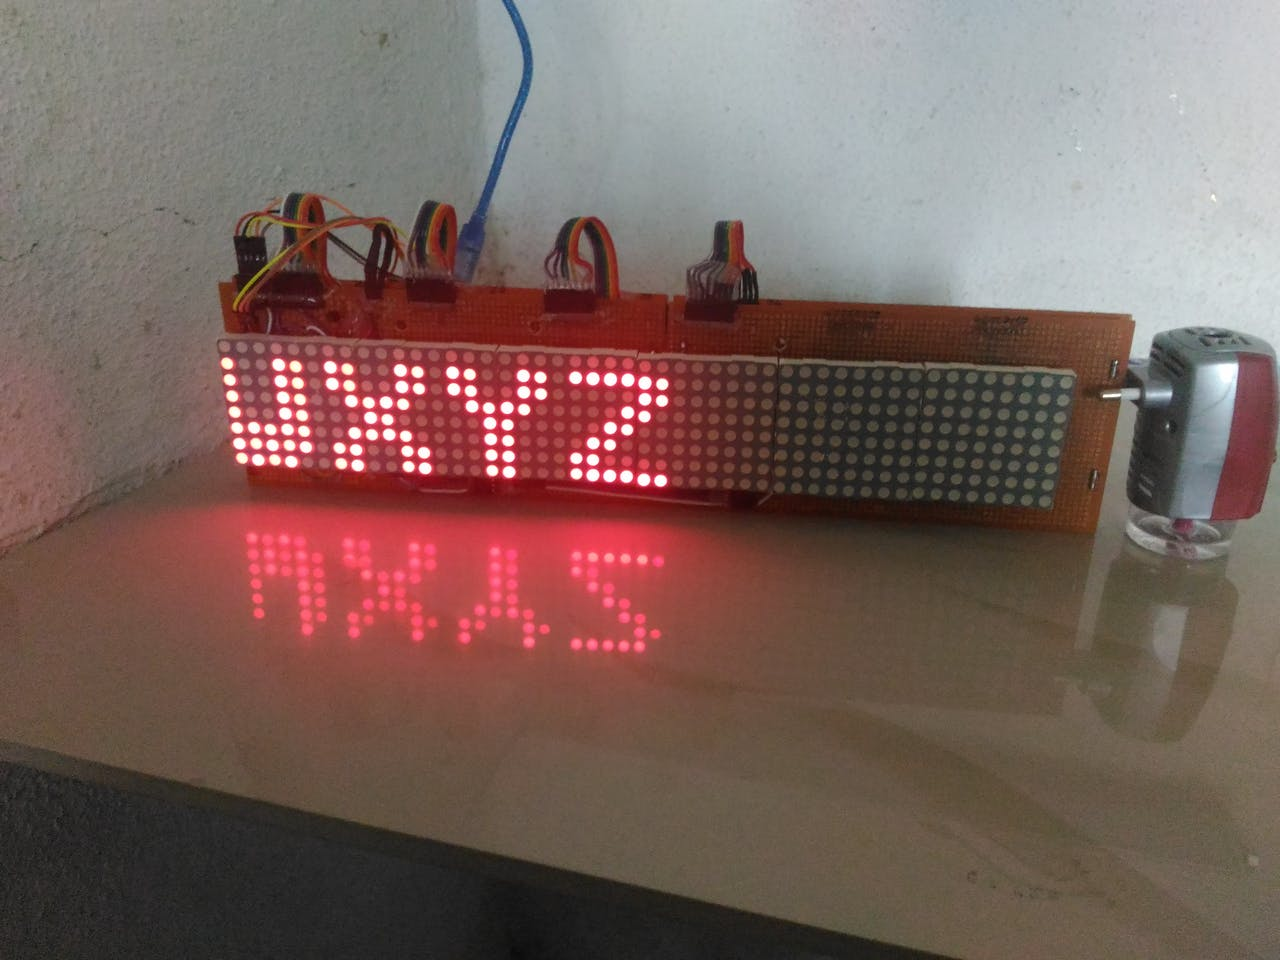 48 X 8 Scrolling Led Matrix Using Arduino Digital Signage Wiring Diagram